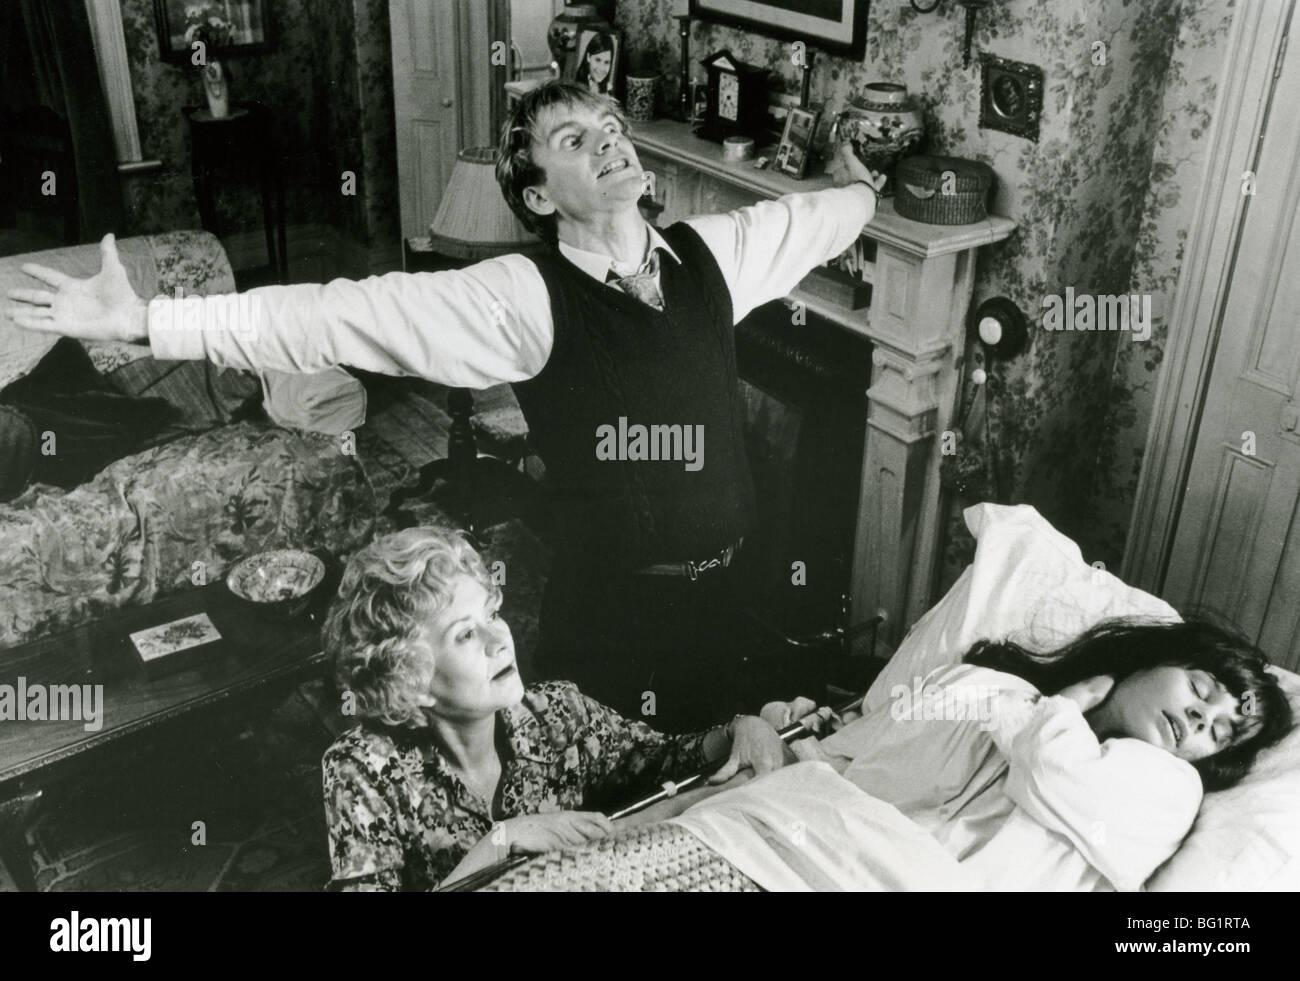 BRIMSTONE AND TREACLE  - 1962 Namara film with from left: Joan Plowright, Sting and Suzanna Hamilton - Stock Image